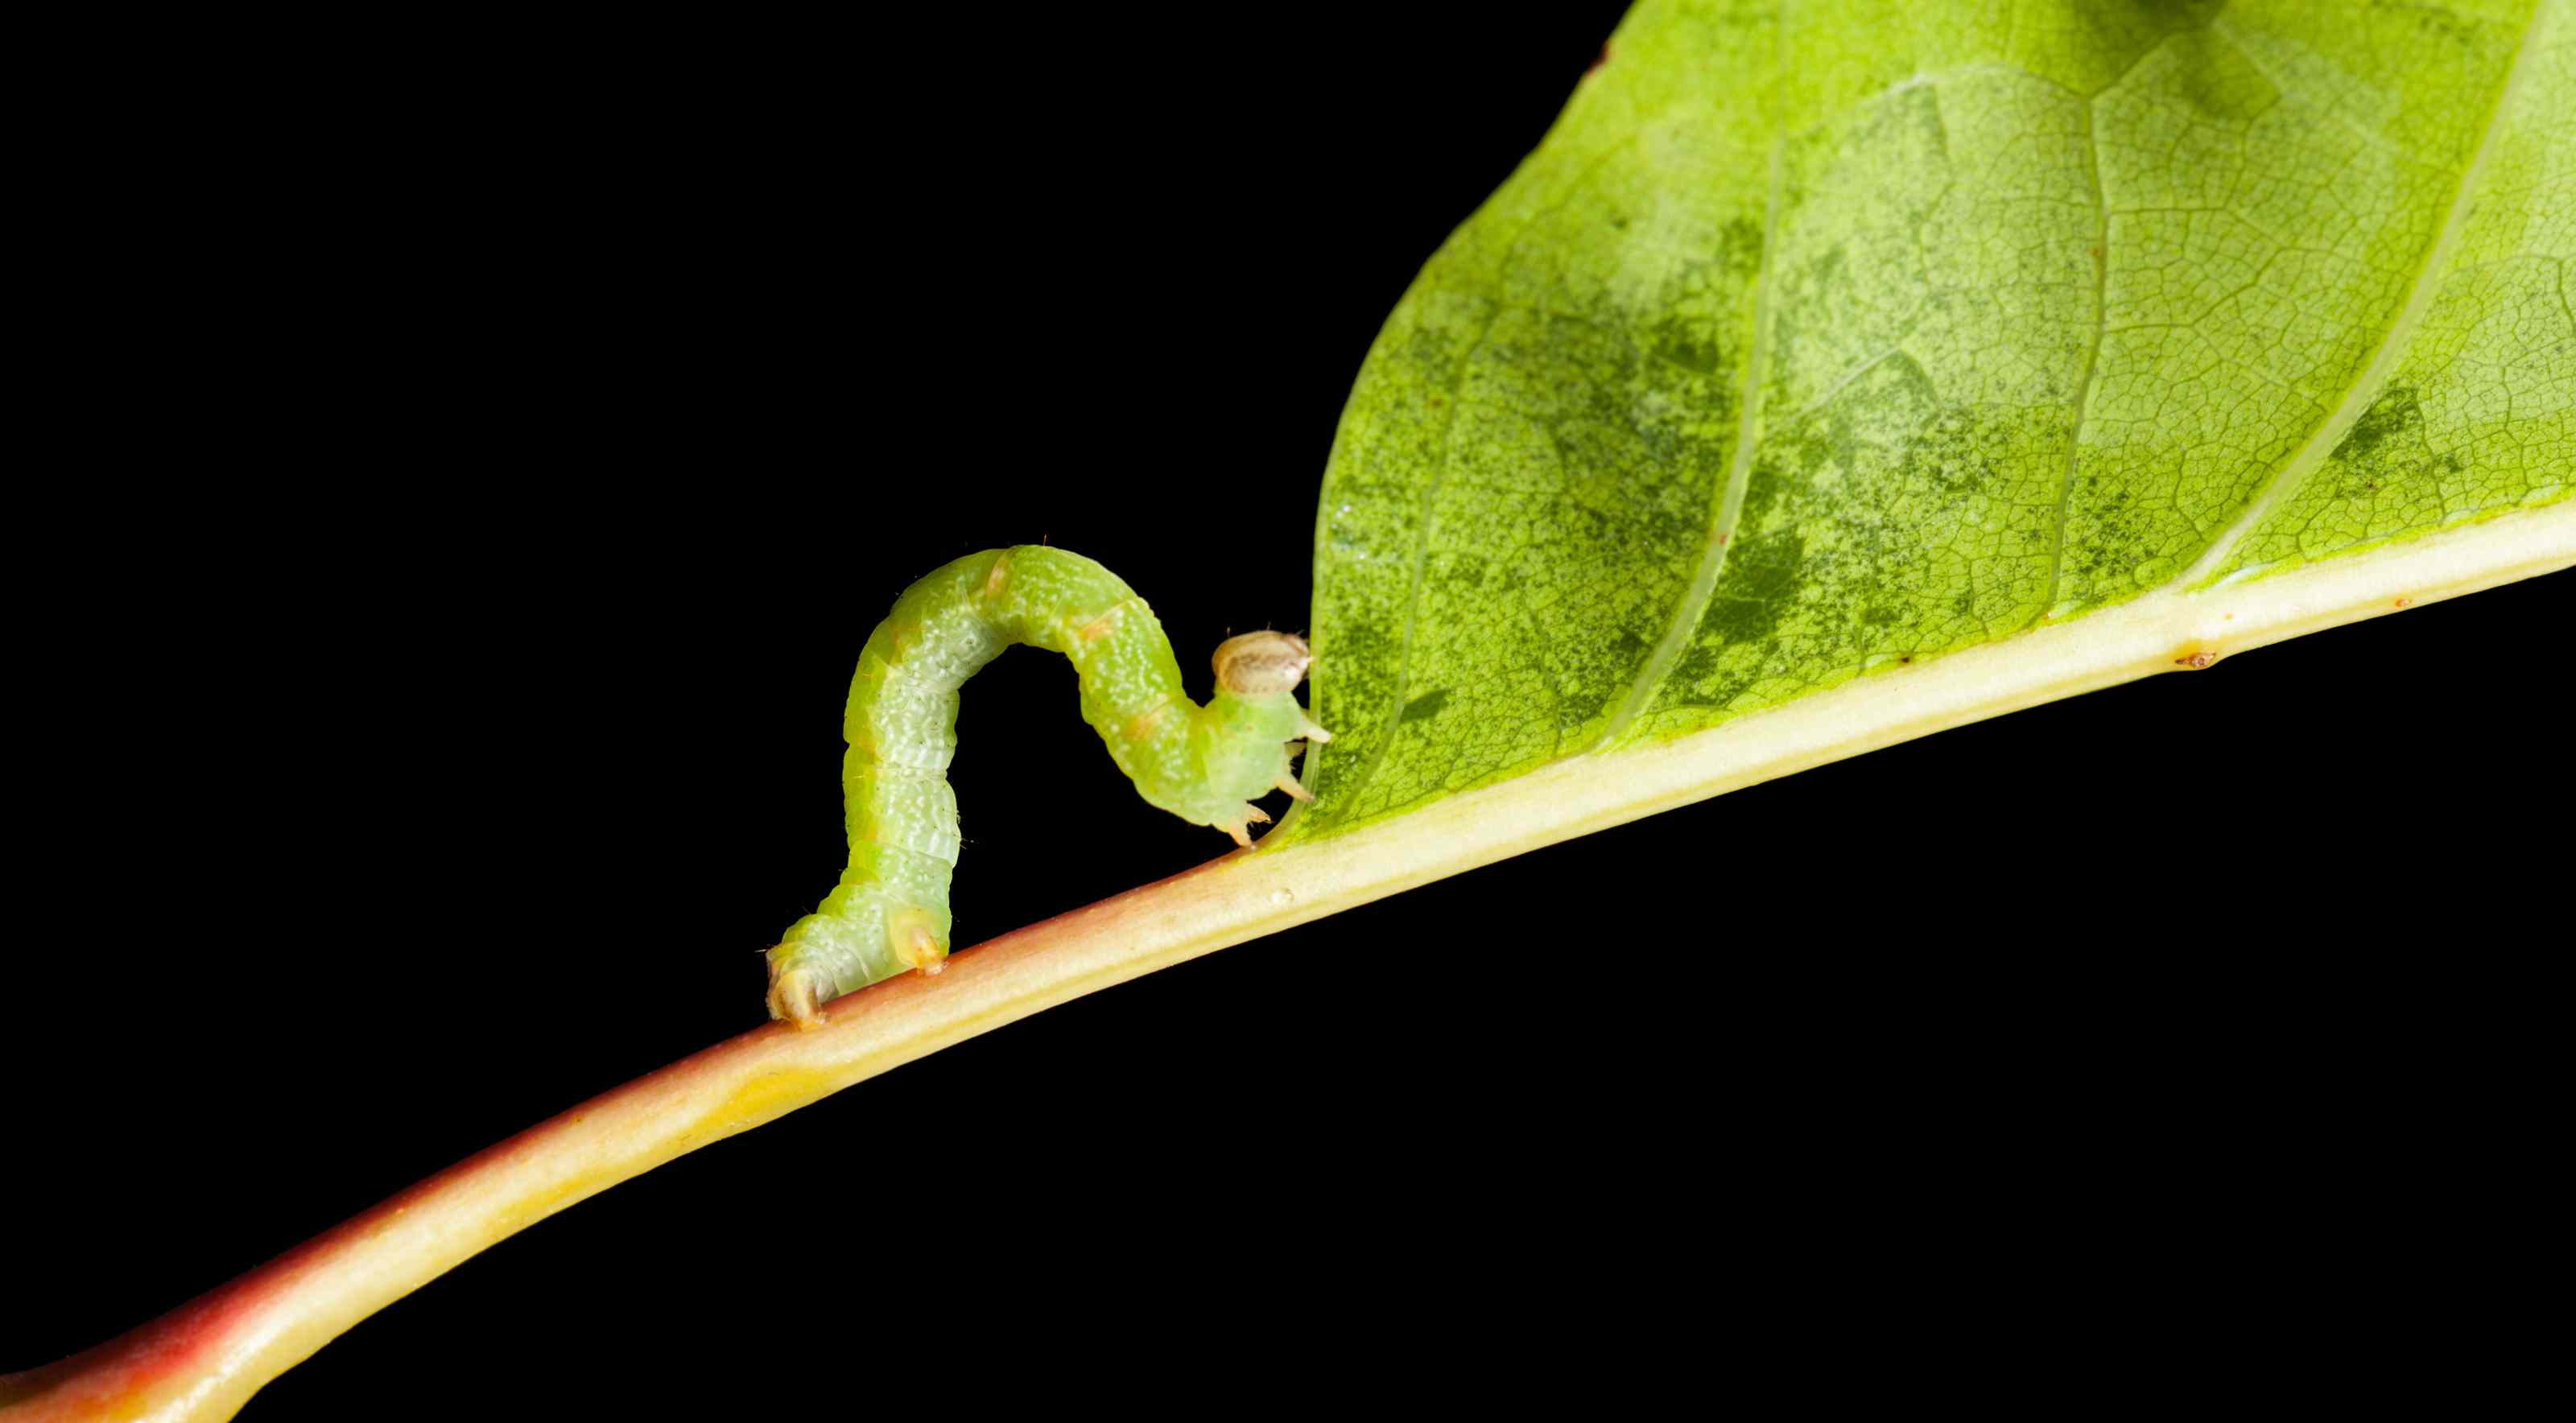 looper caterpillar eating a leaf